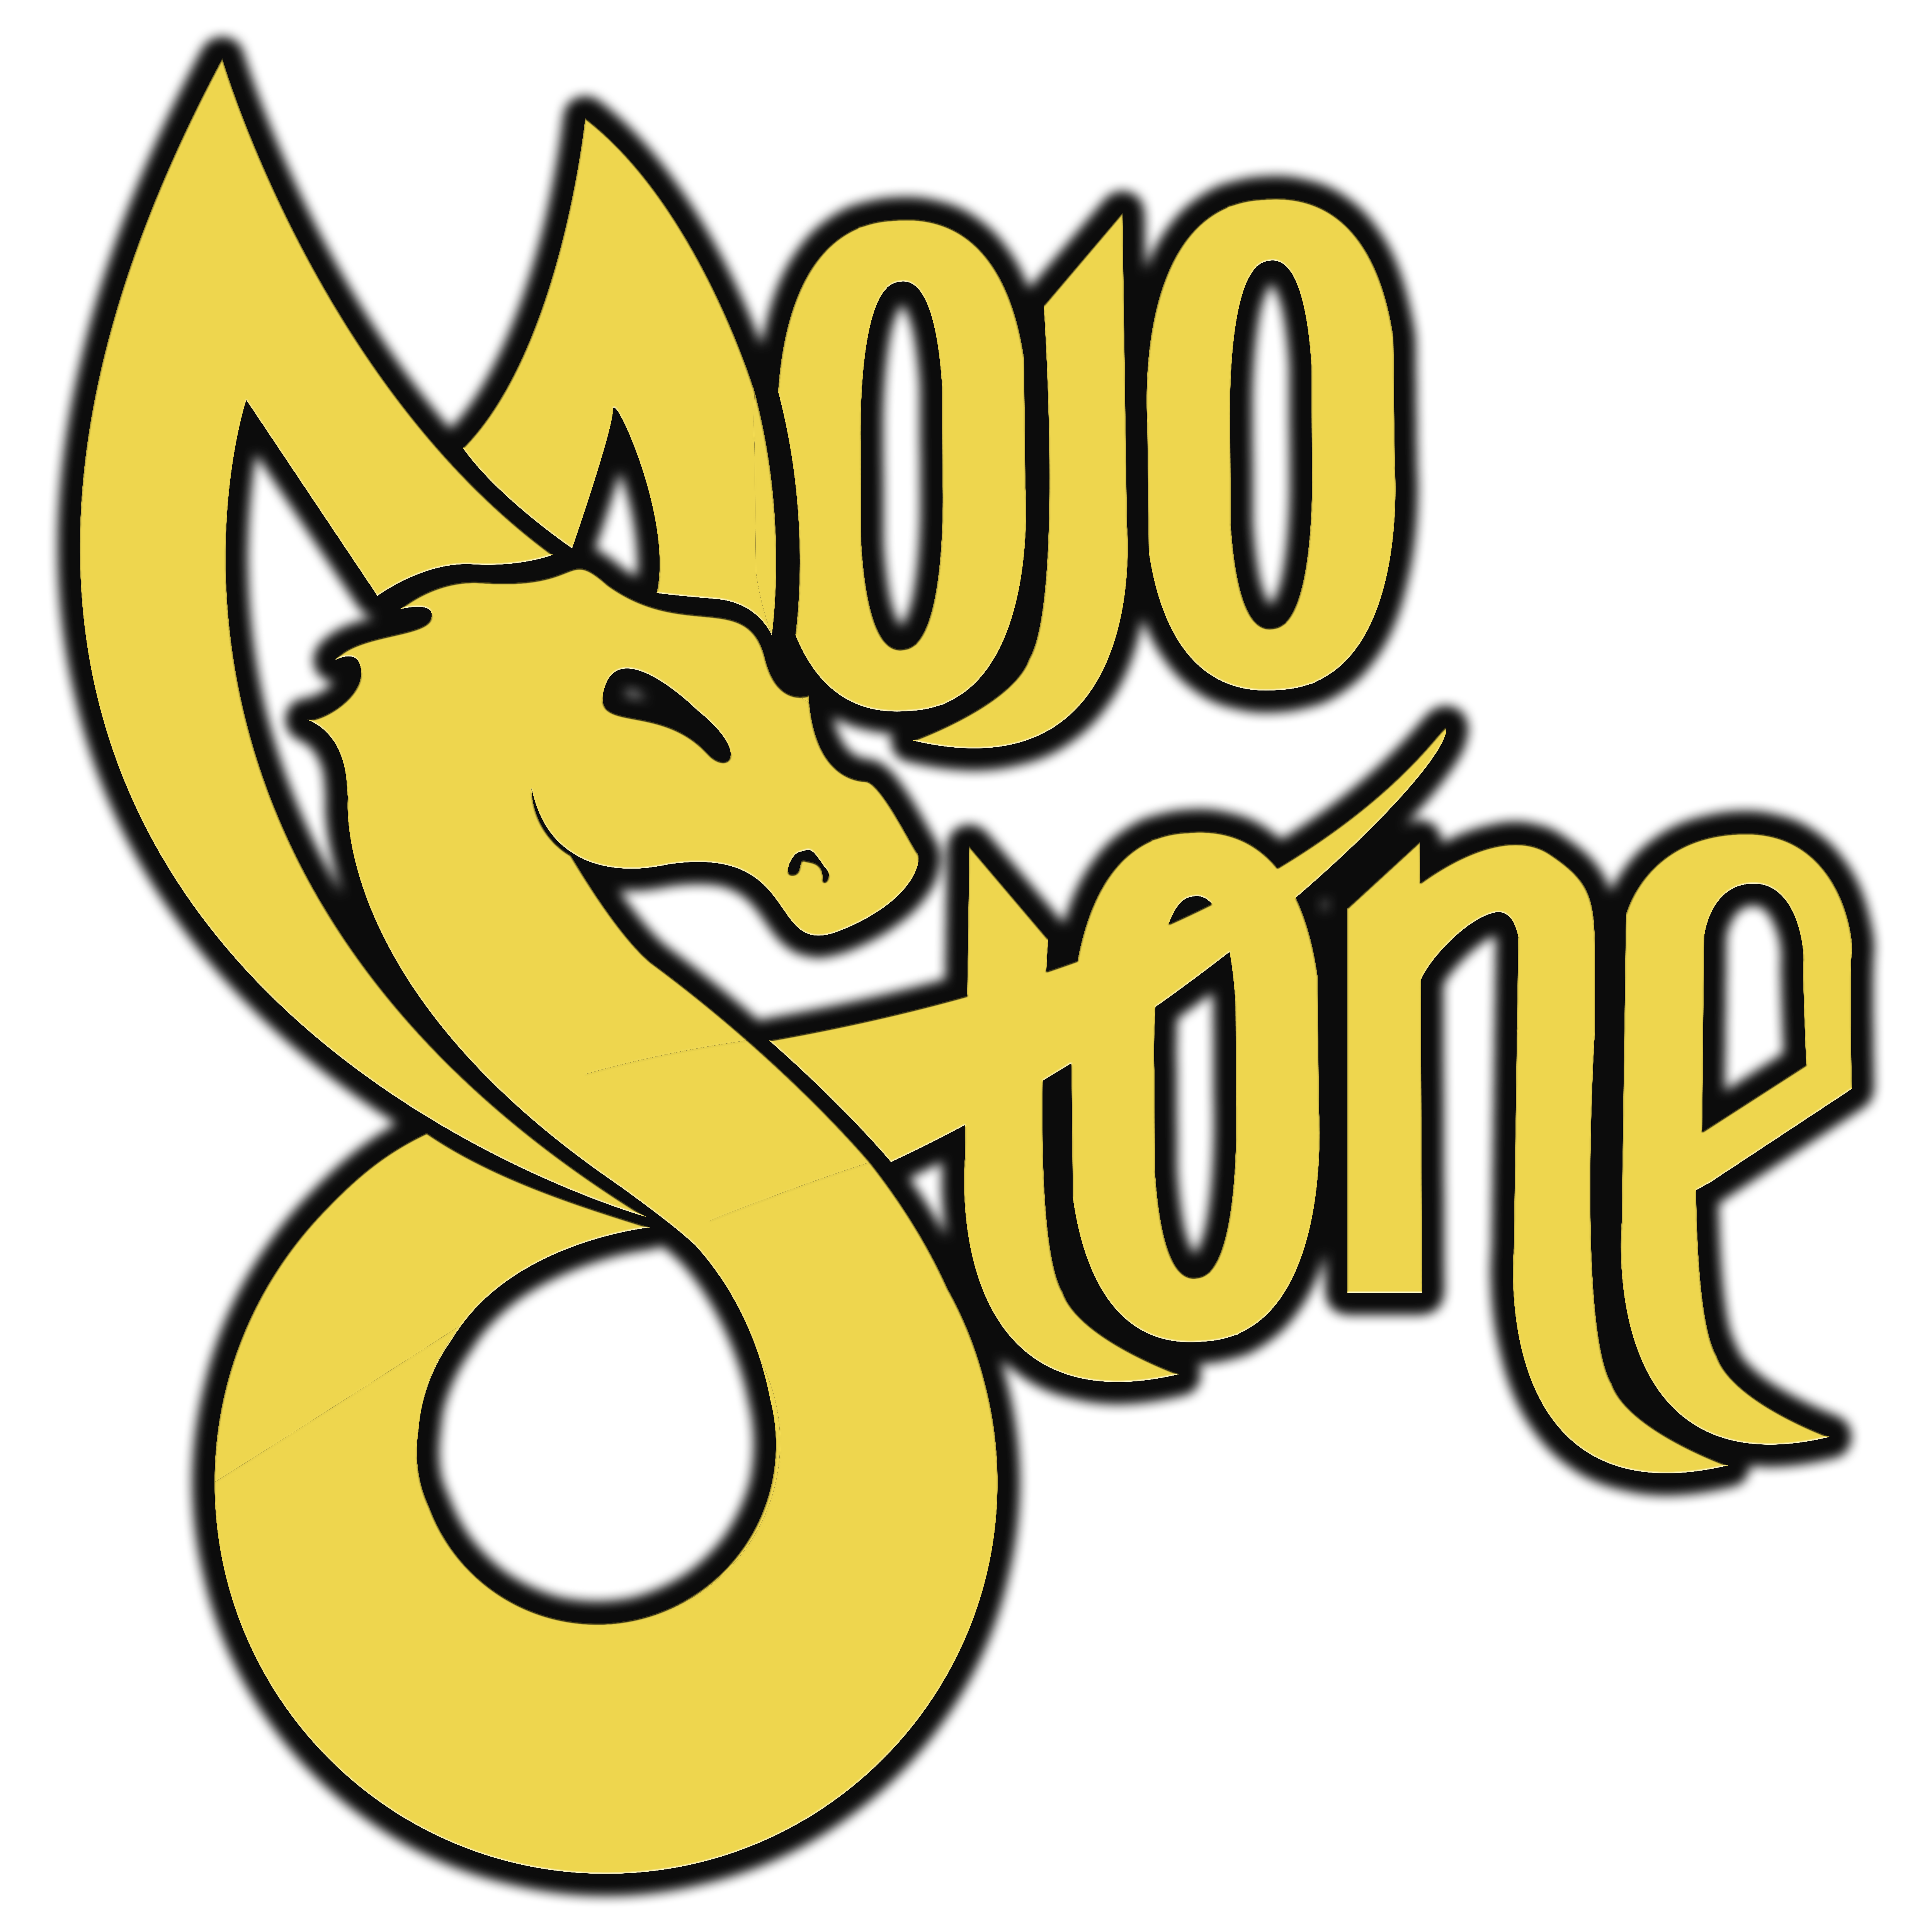 Stone clipart hard rock #4